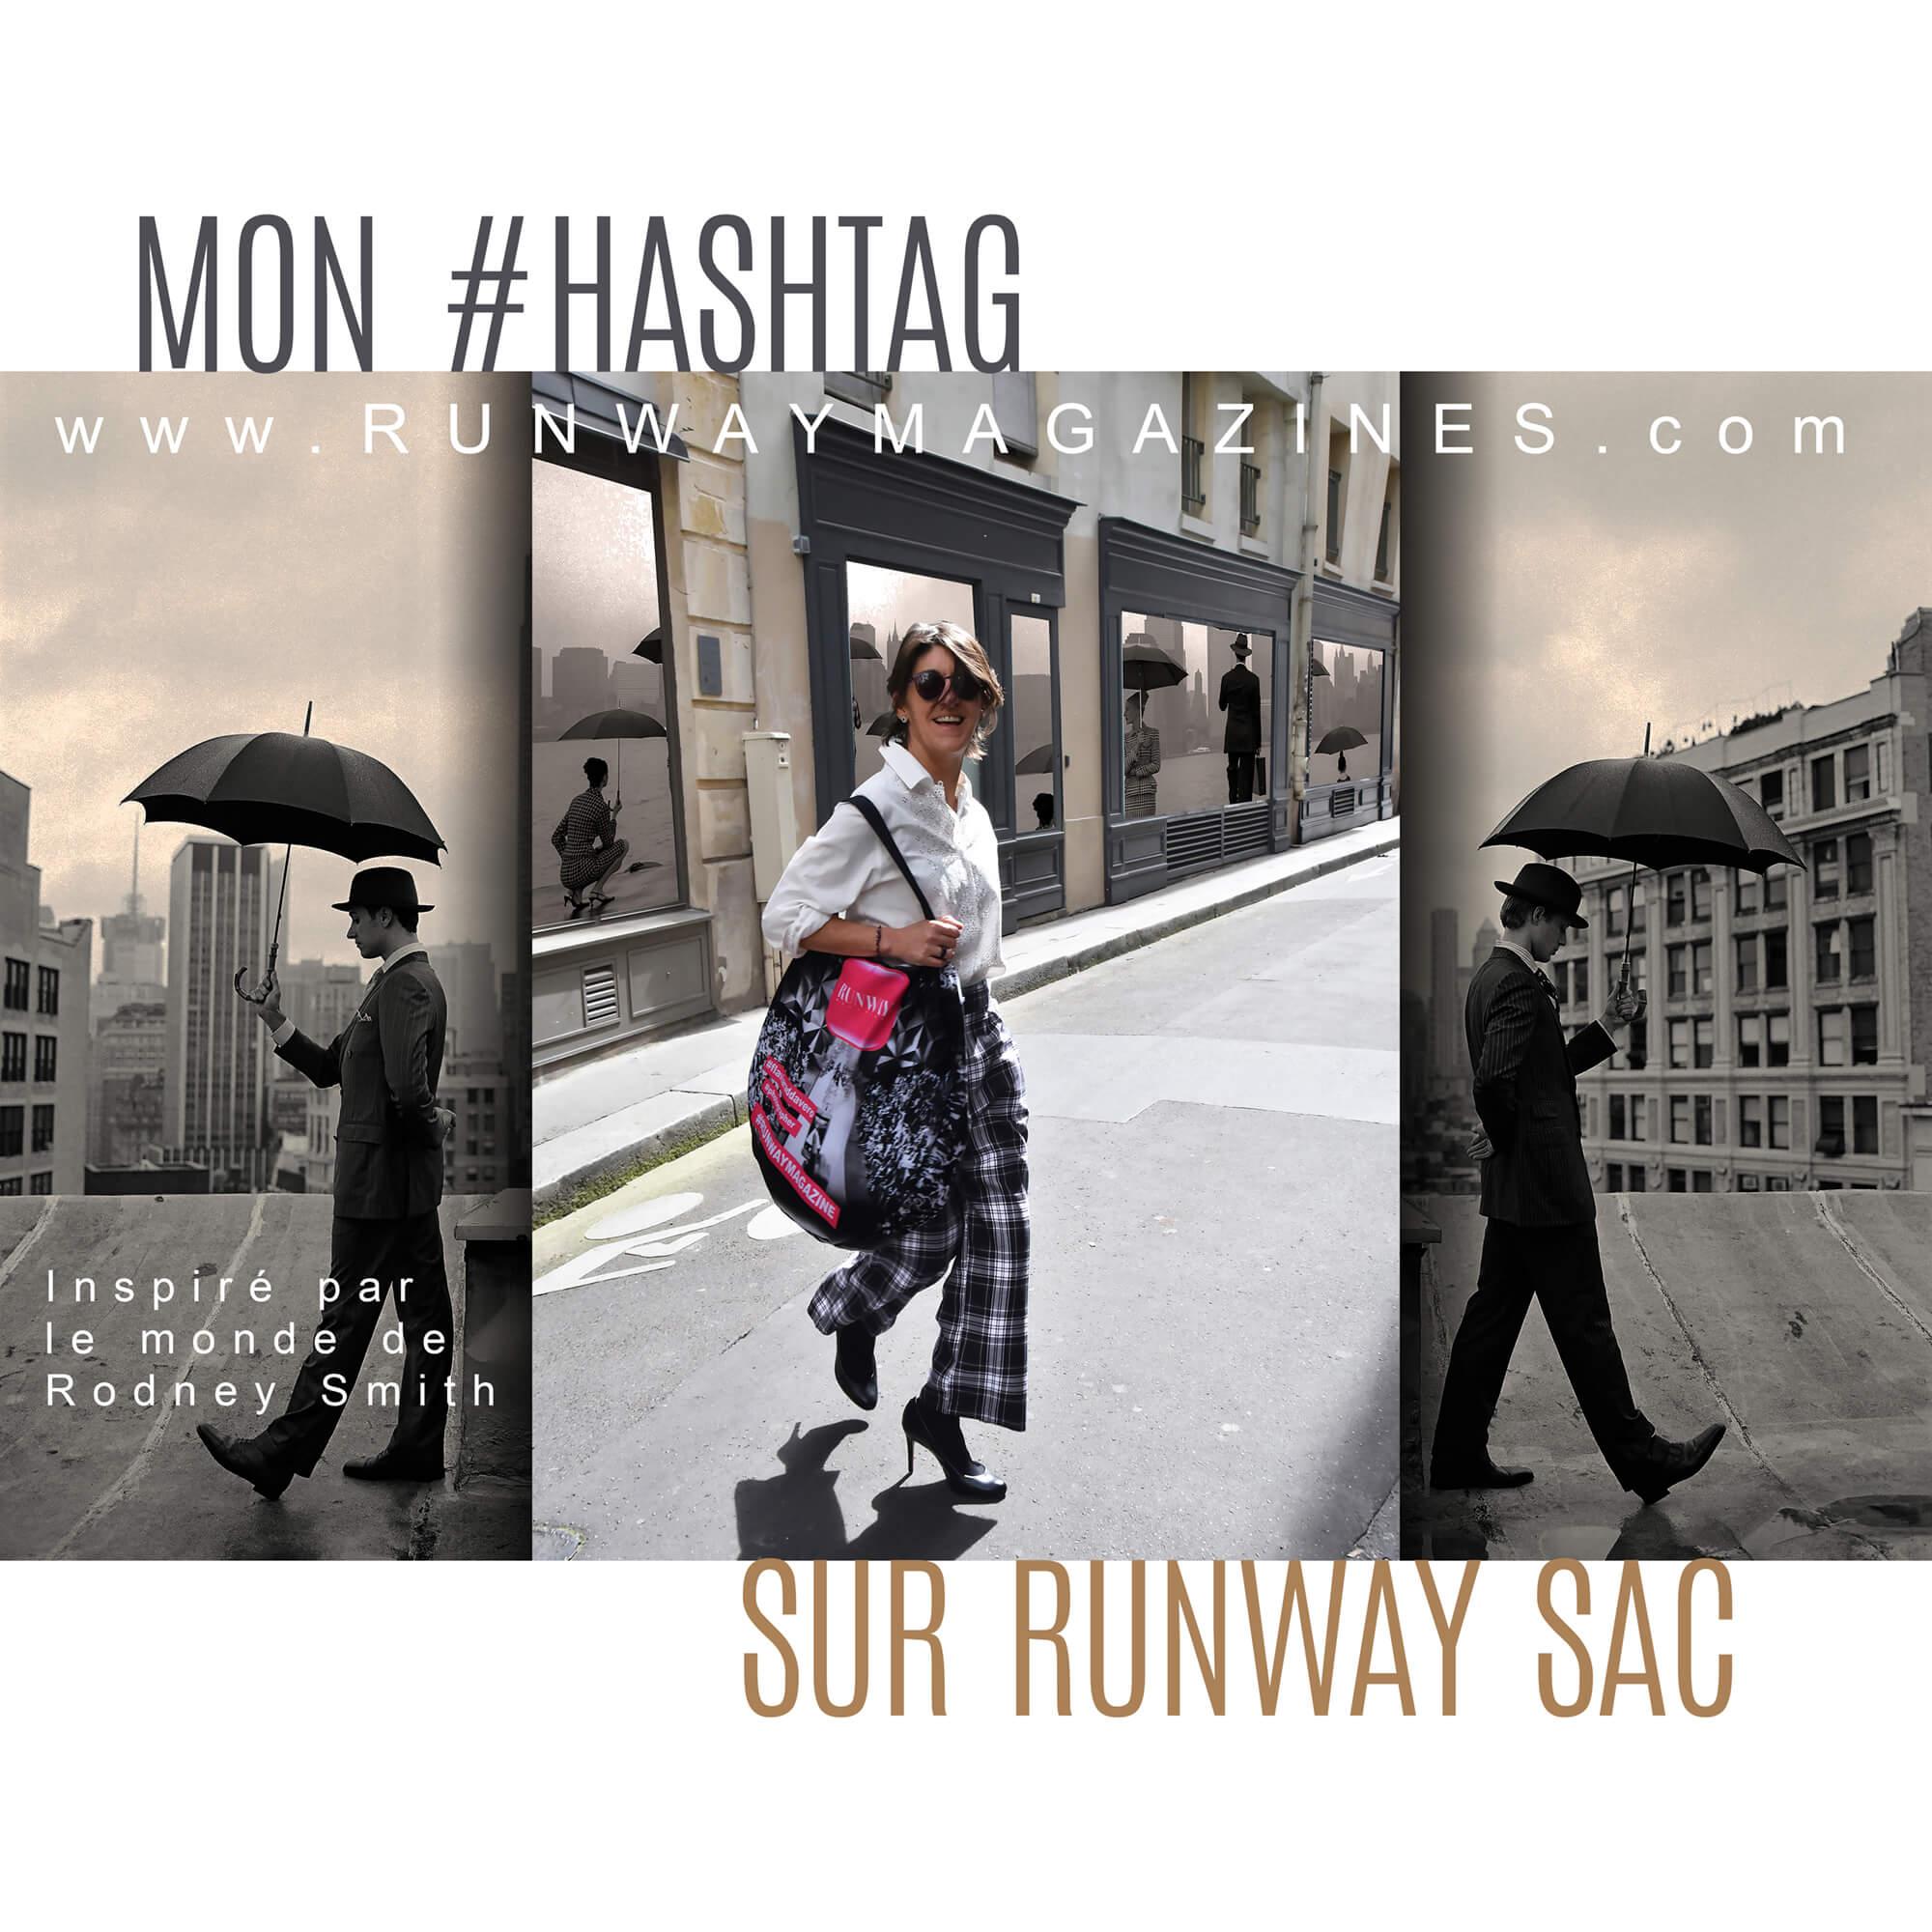 My hashtag on Runway Bag by Fashion Photographer - Rodney Smith